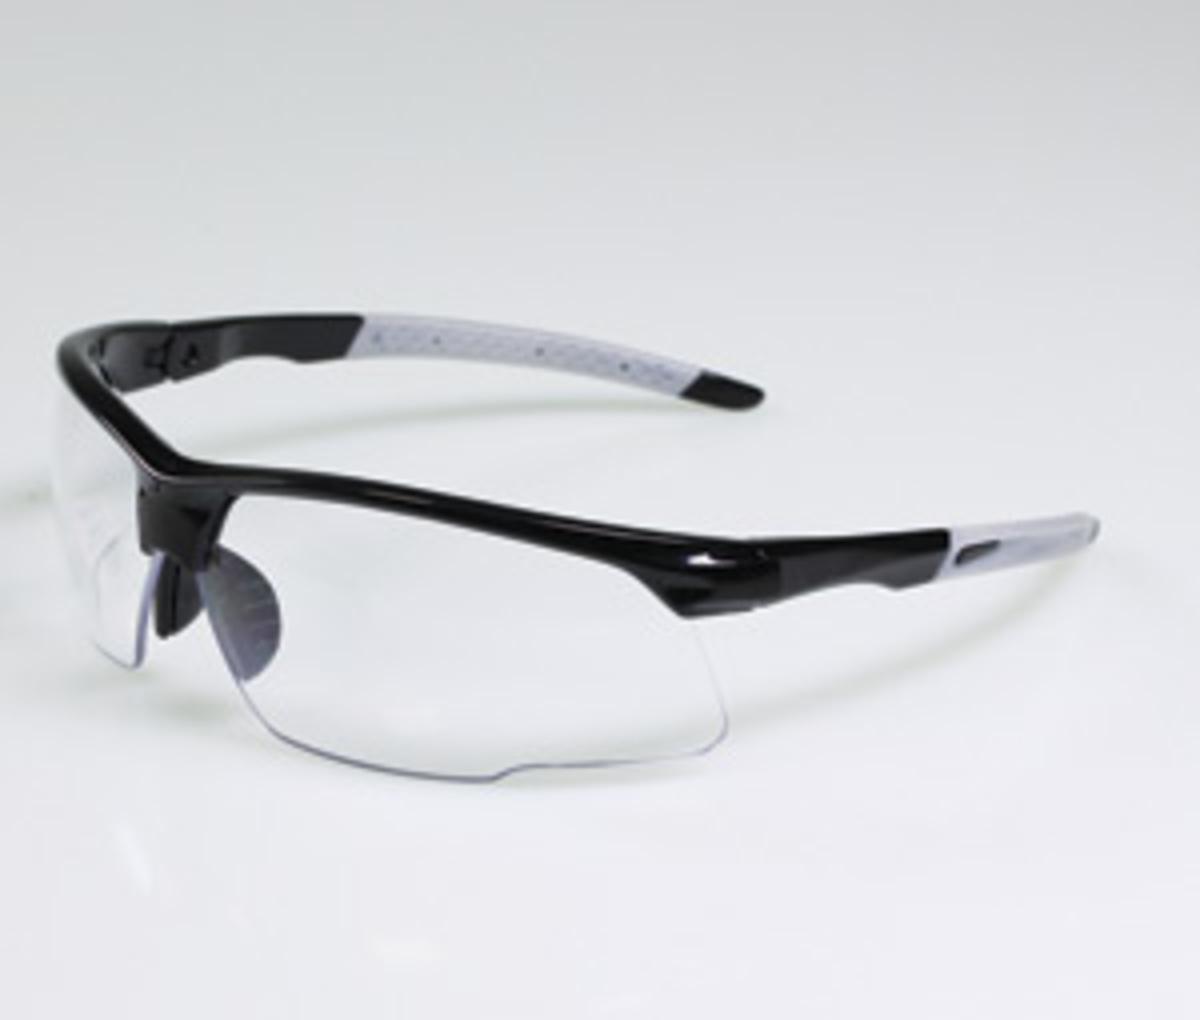 Airgas - RAD64051542 - Radnor® QuartzSight5™ Safety Glasses With ...